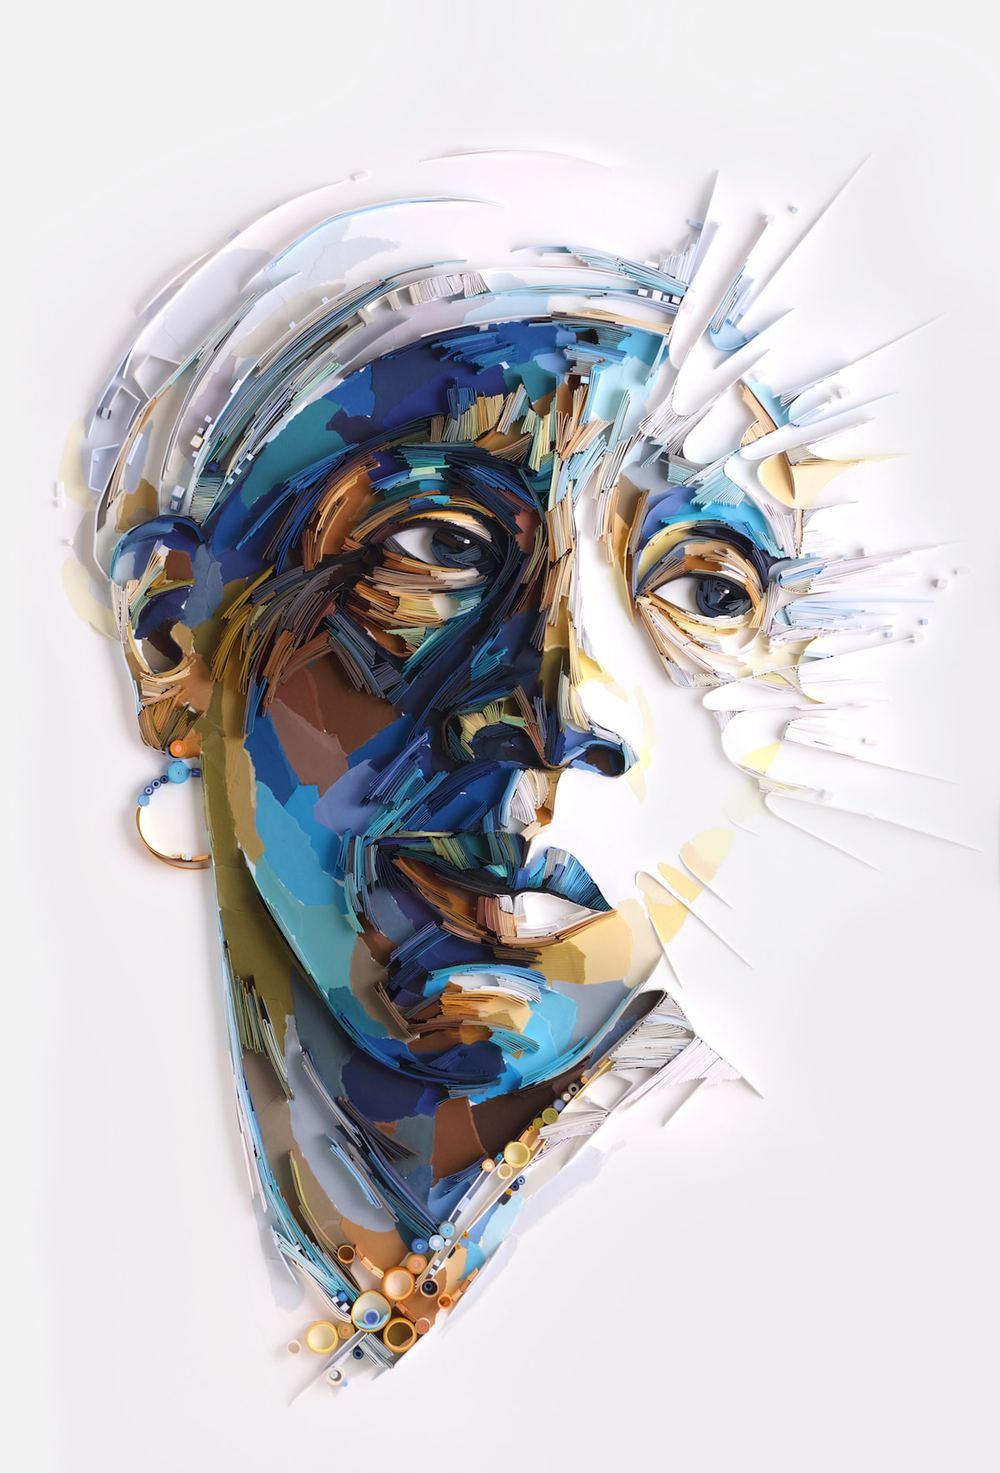 yulia brodskaya quilling paper art